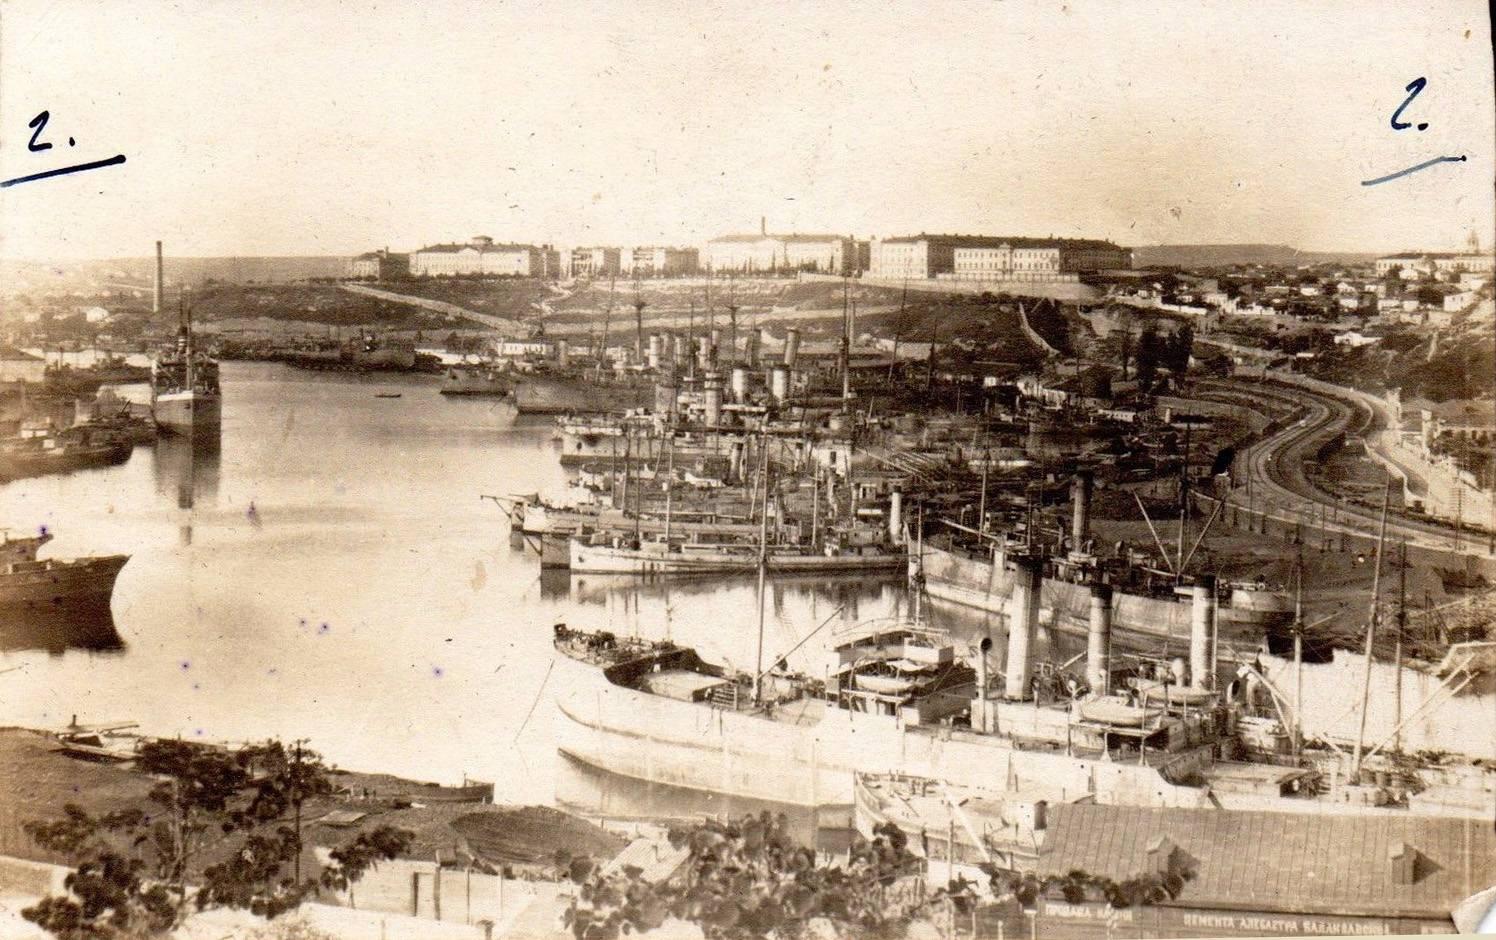 1920. Панорама города (фрагмент)